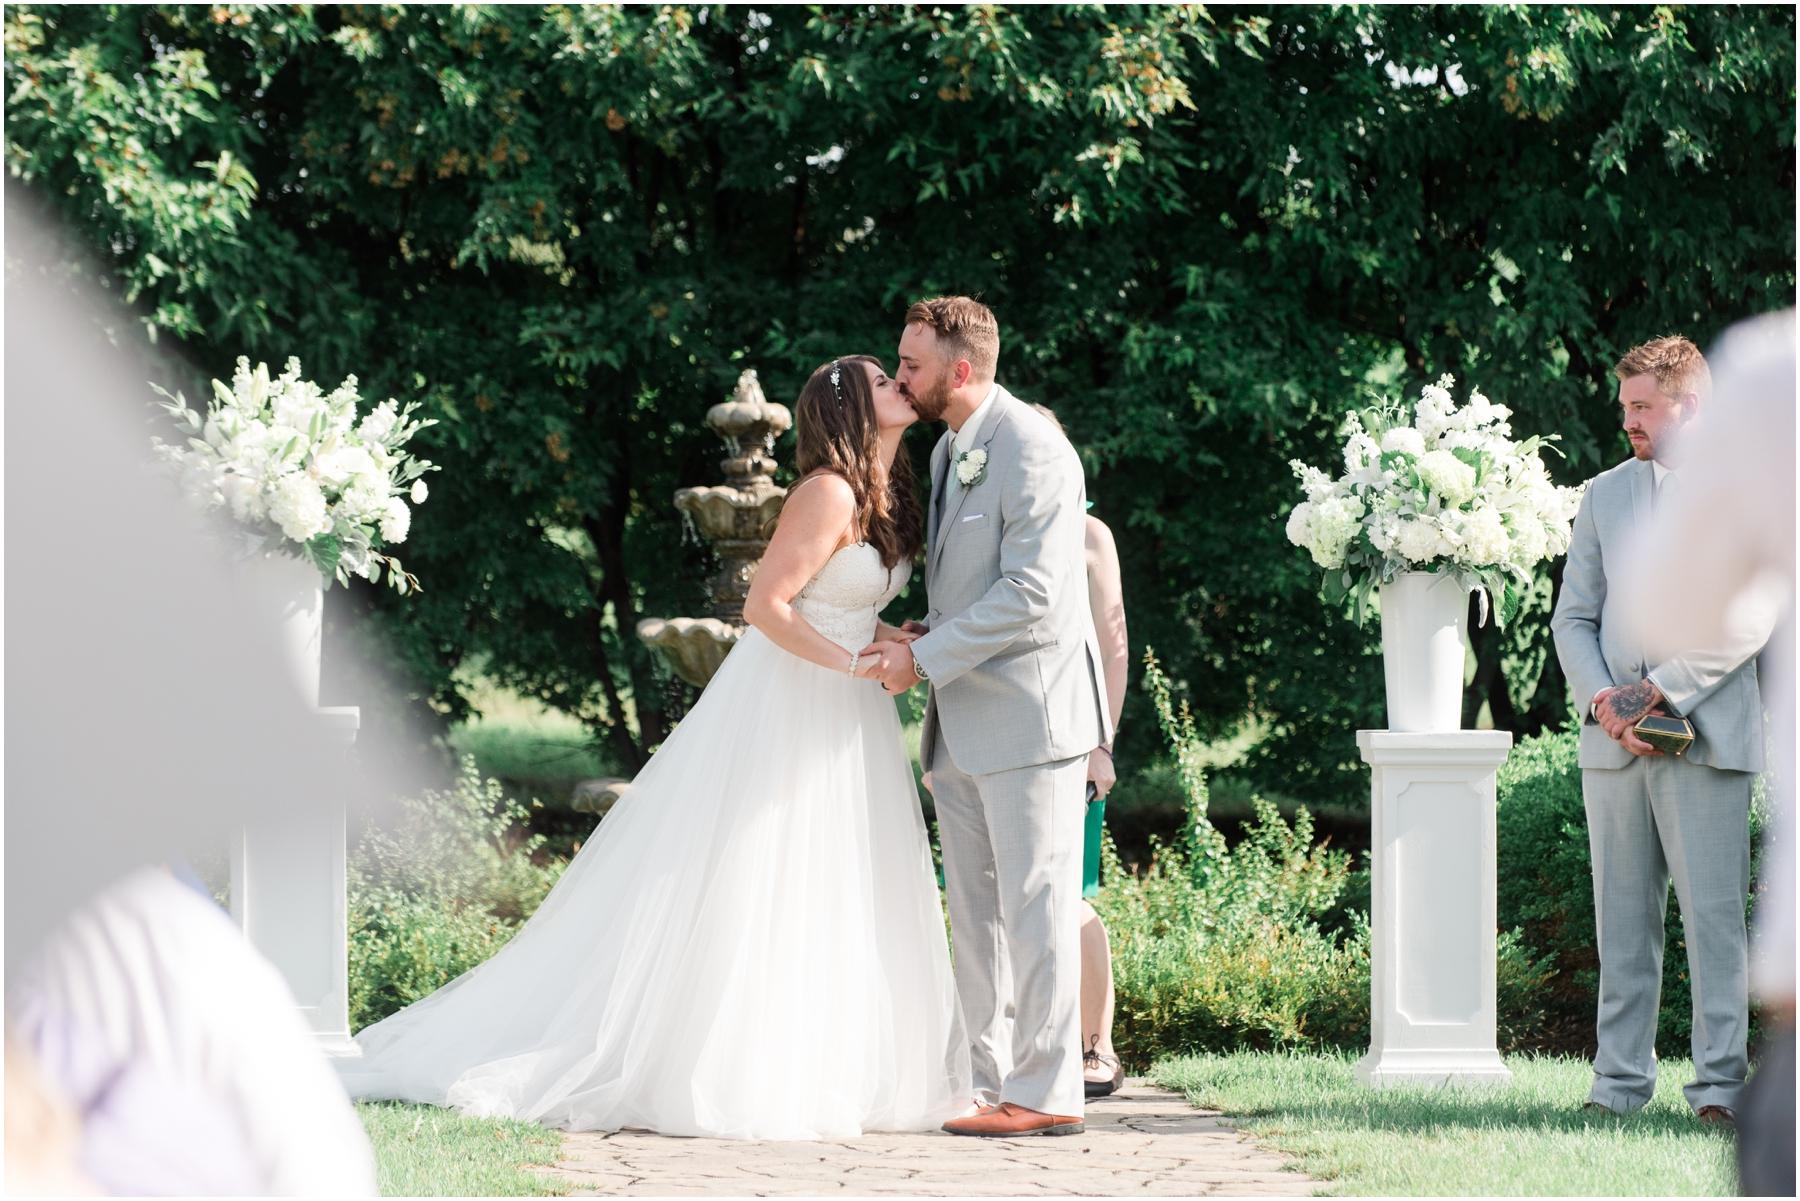 Bloom Field Gardens Wedding Precious Photography_0375